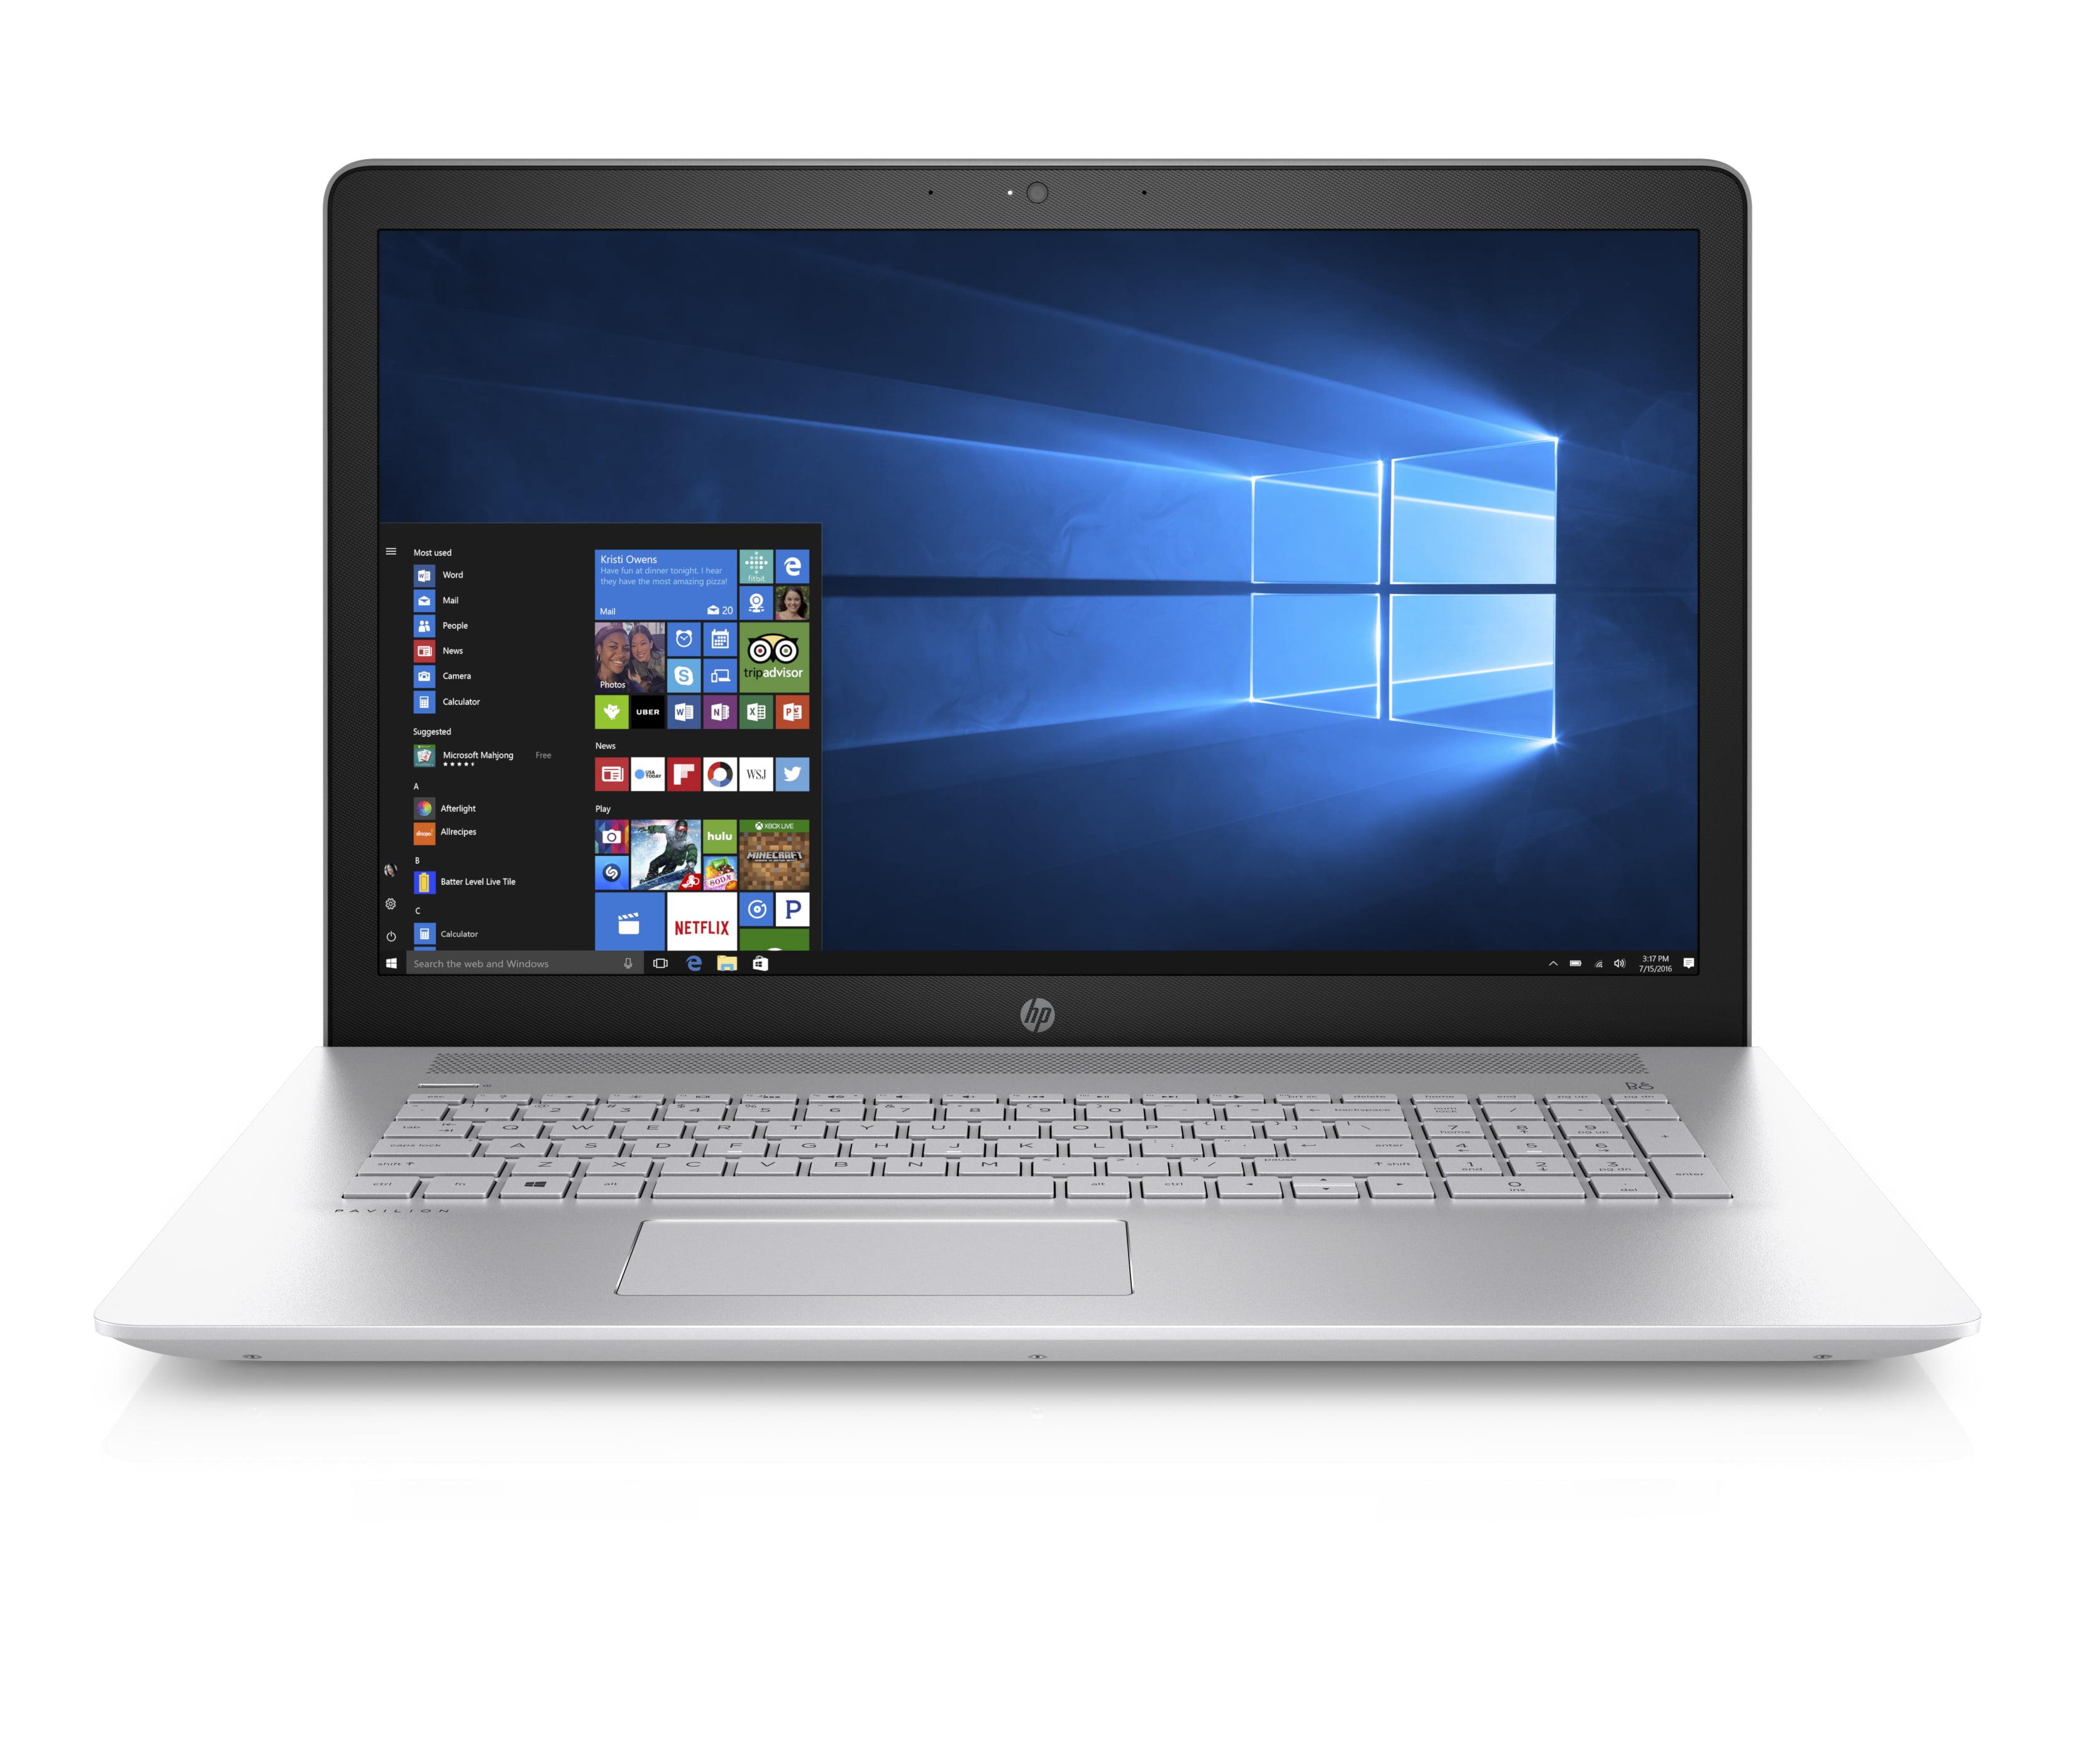 "HP Pavilion 17-ar050wm, 17.3"" Laptop, Full HD IPS Dislpay, Windows 10 Home, AMD A10-9620P QC, 8GB Memory,... by HP"